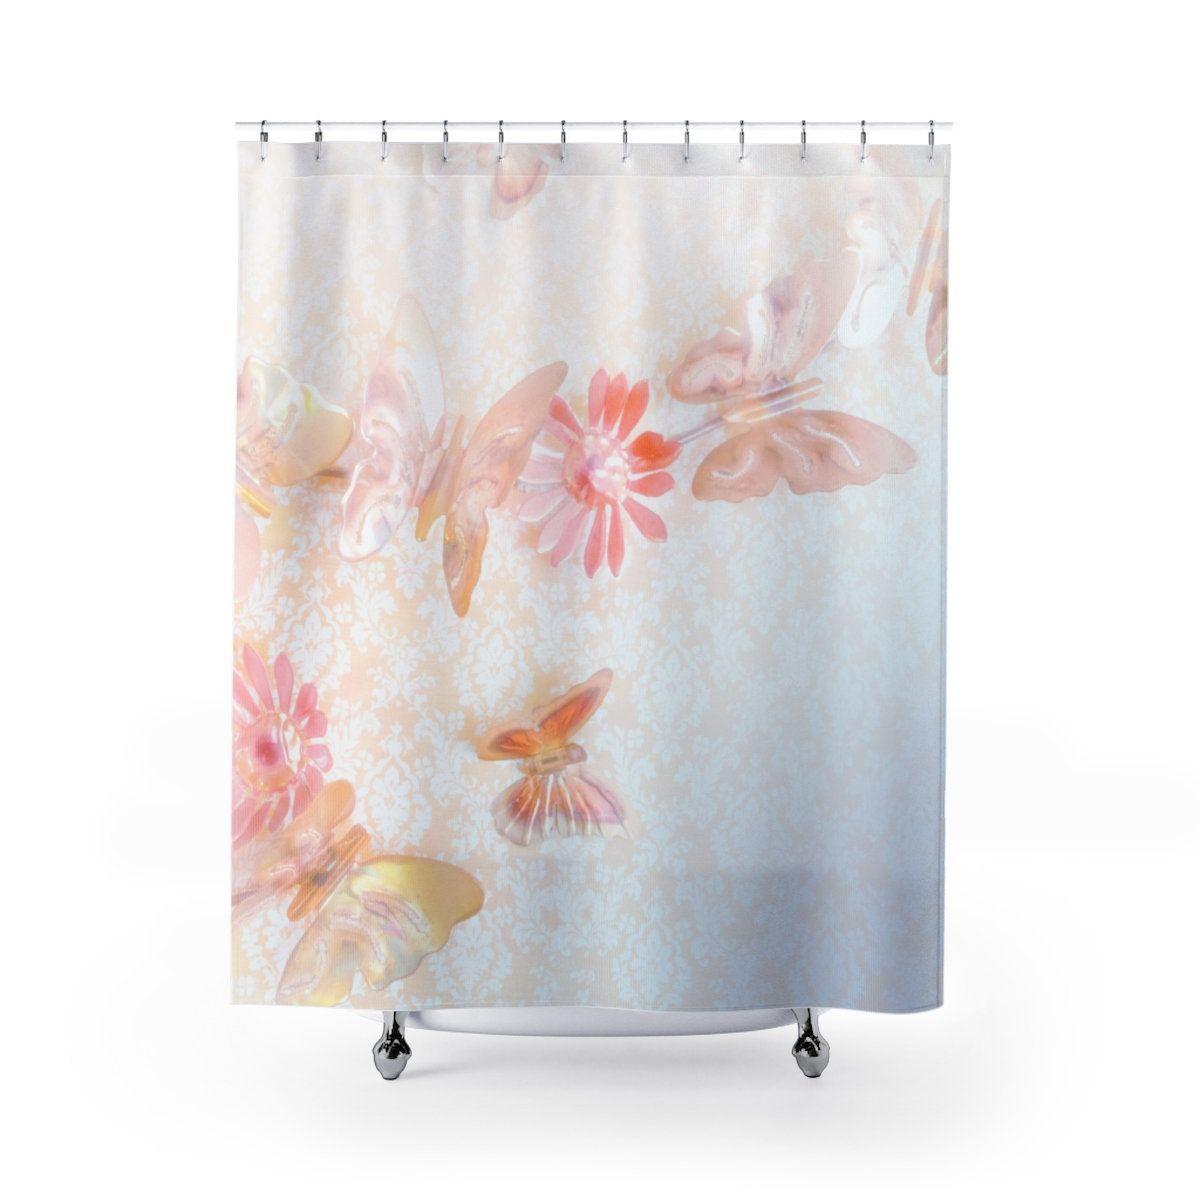 Butterfly Shower Curtain Elegant Pastel Butterflies Floral Shower